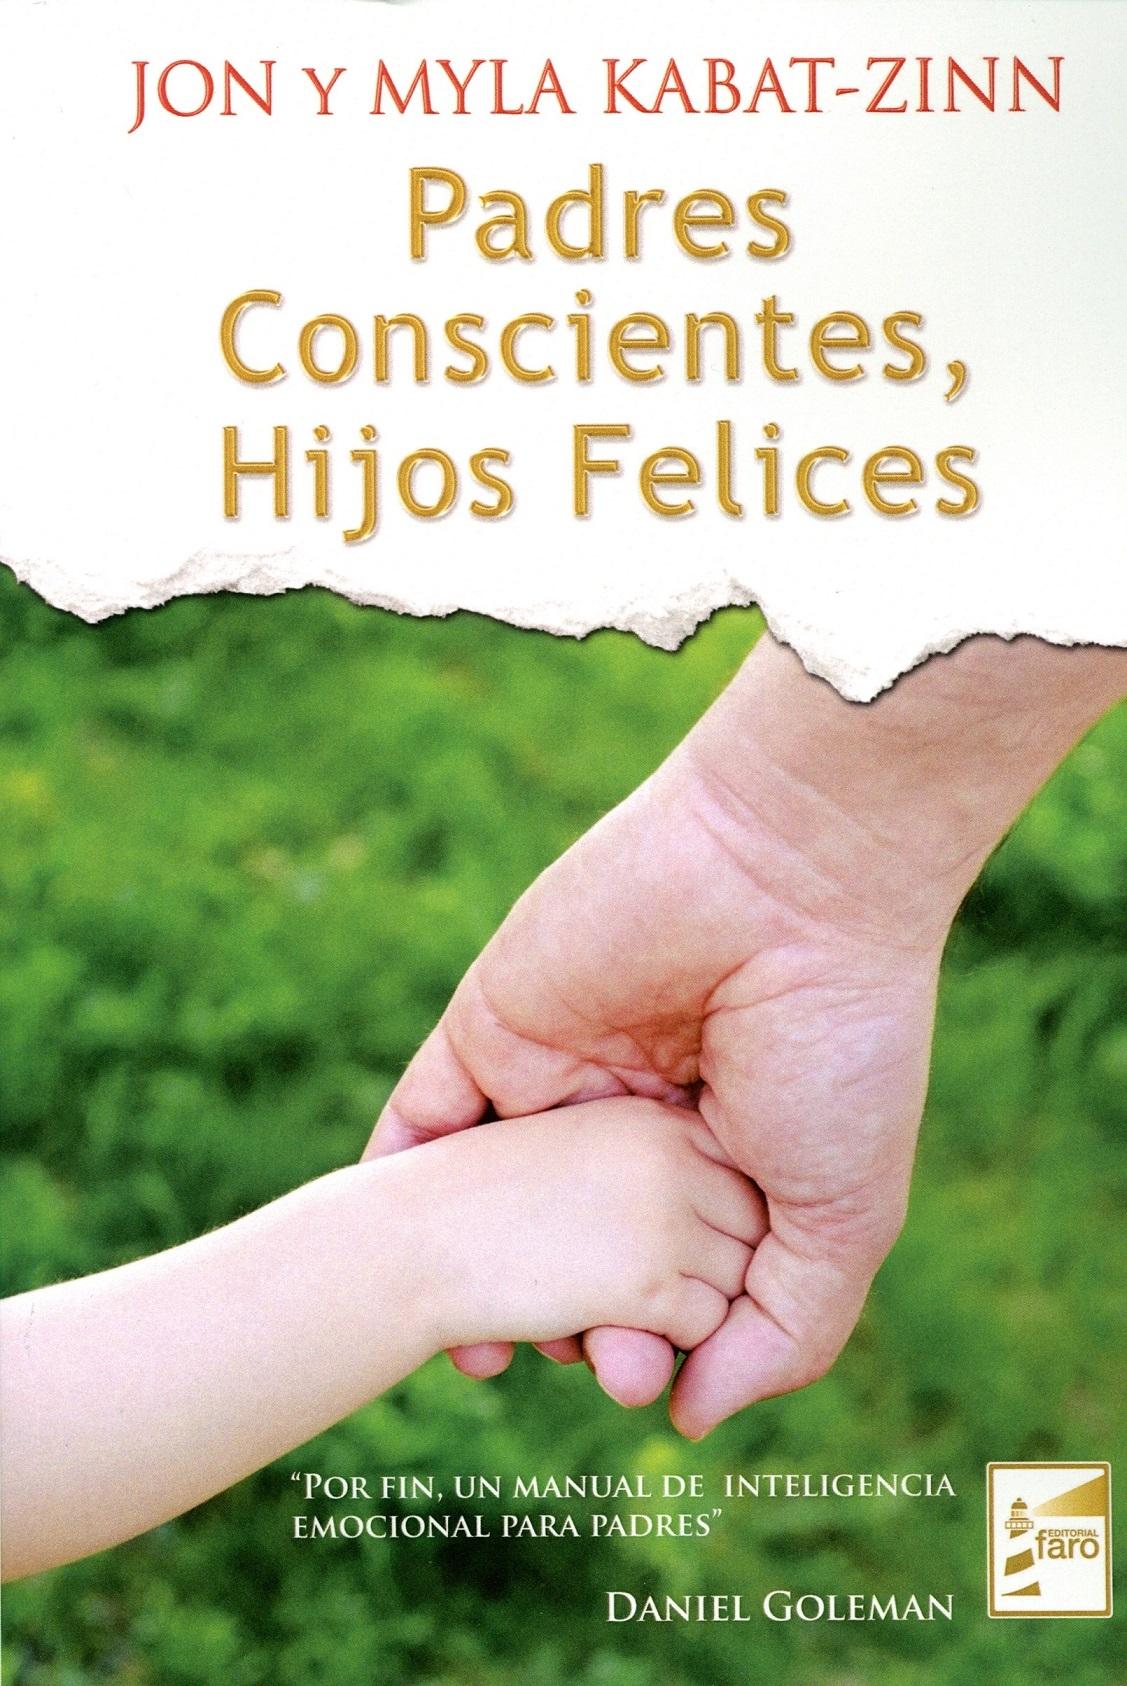 Padres Conscientes, Hijos Felics